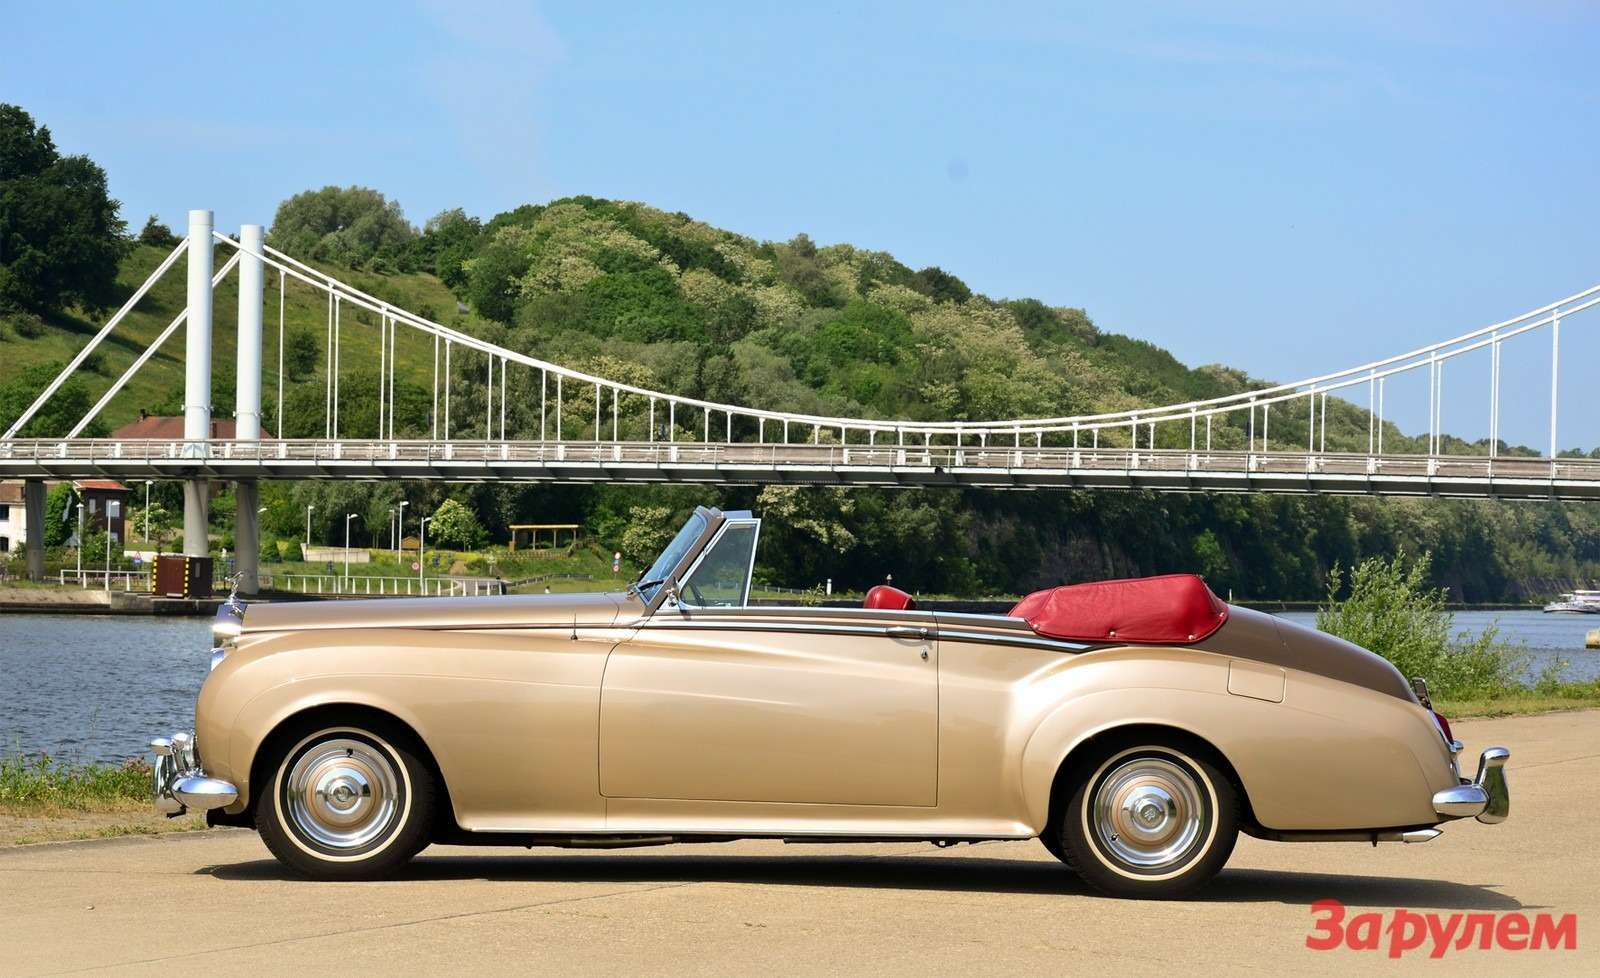 1962. Rolls-Royce Silver Cloud IIDrophead Coupé